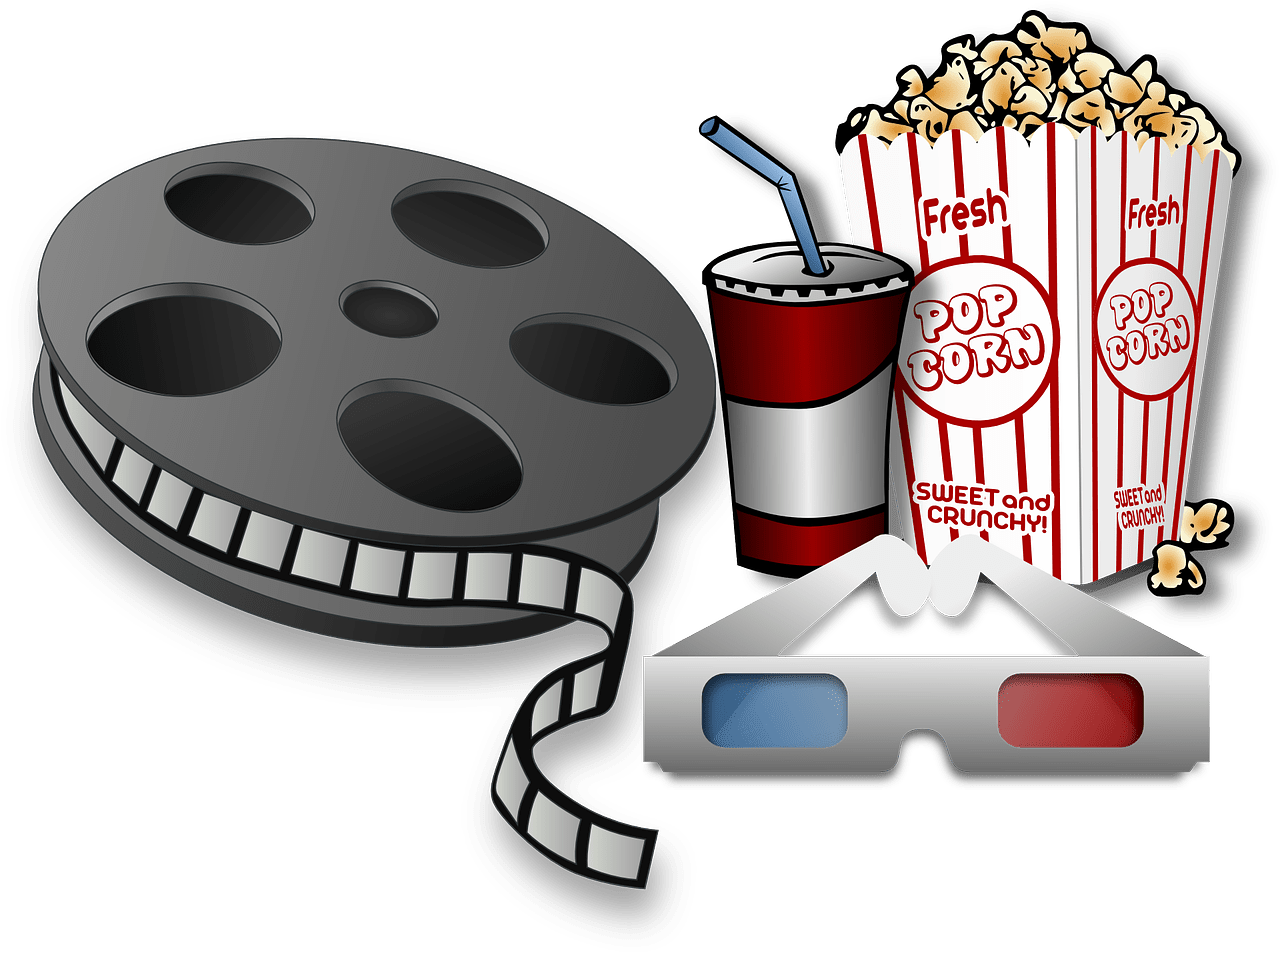 Andare al cinema clipart jpg transparent Cinema e autismo, una magia riservata a pochi - Una famiglia blu jpg transparent